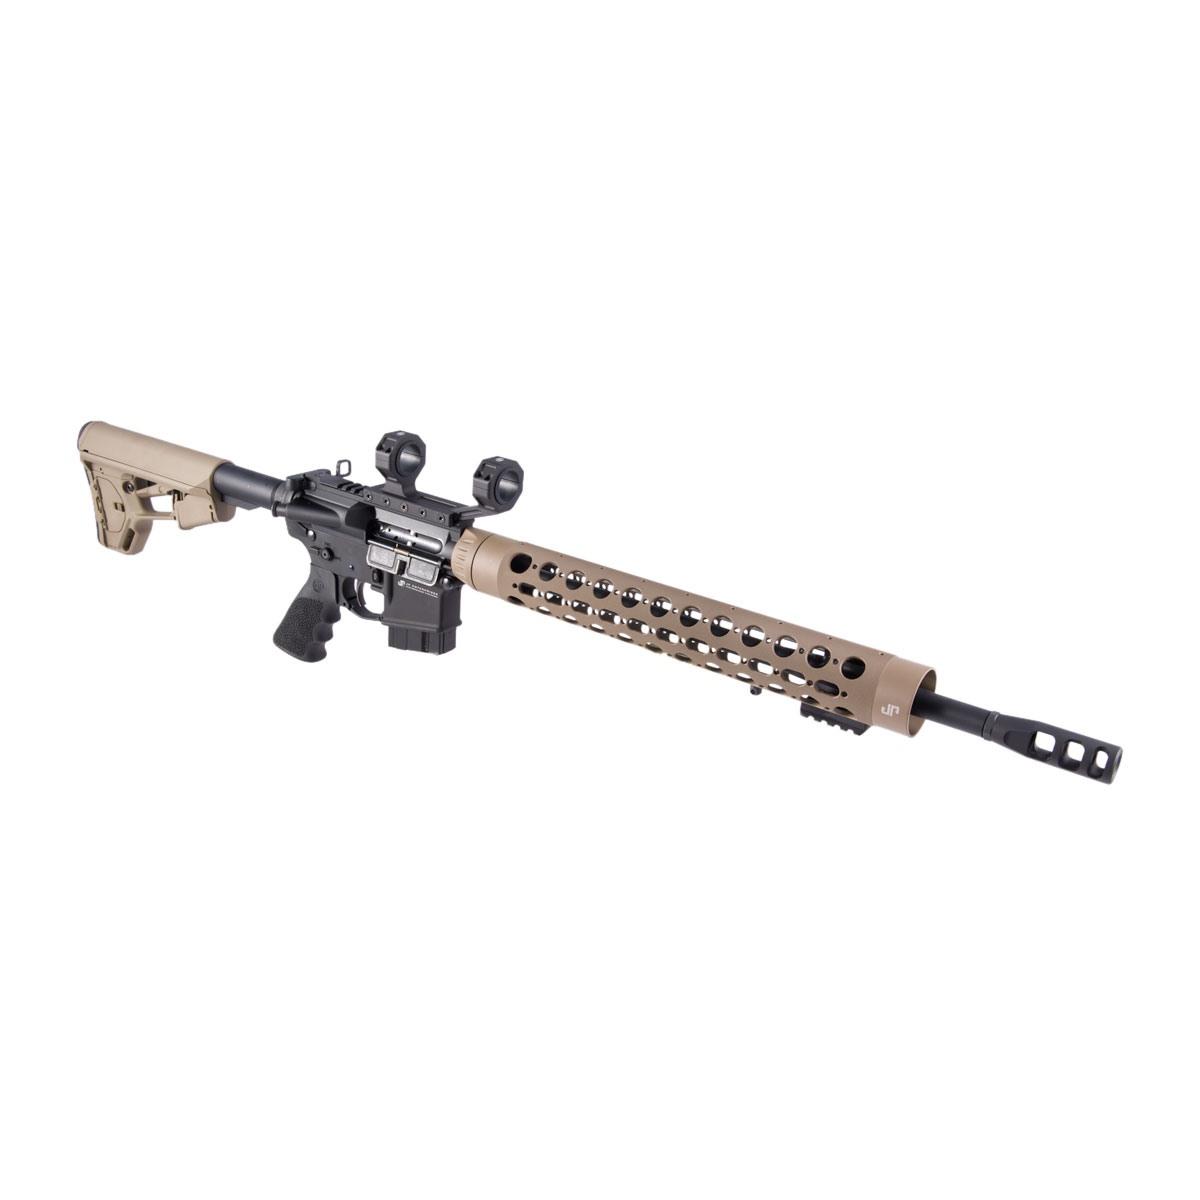 J P Enterprises Jp Rifle Jp 15 6 5 Grendel 18in Barrel